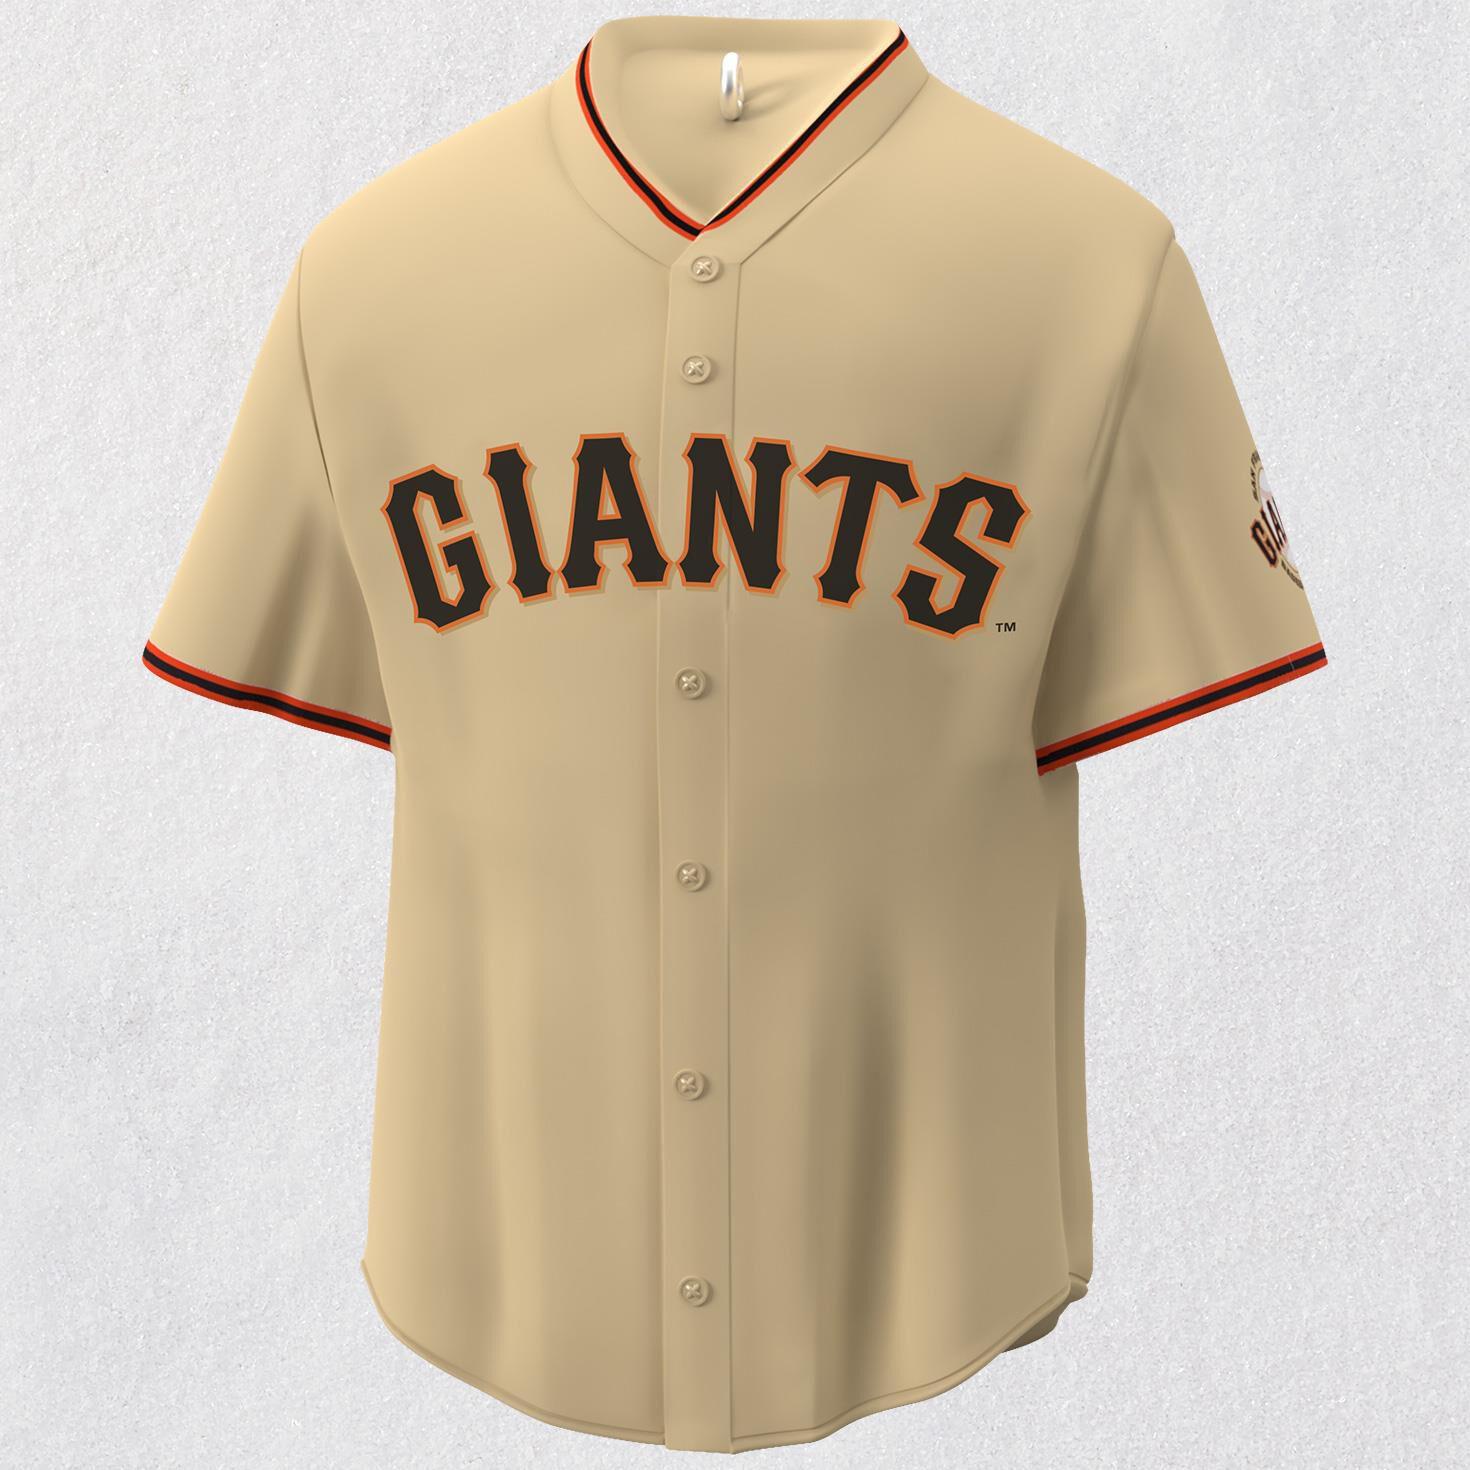 San Francisco Giants™ Jersey Ornament - Keepsake Ornaments - Hallmark